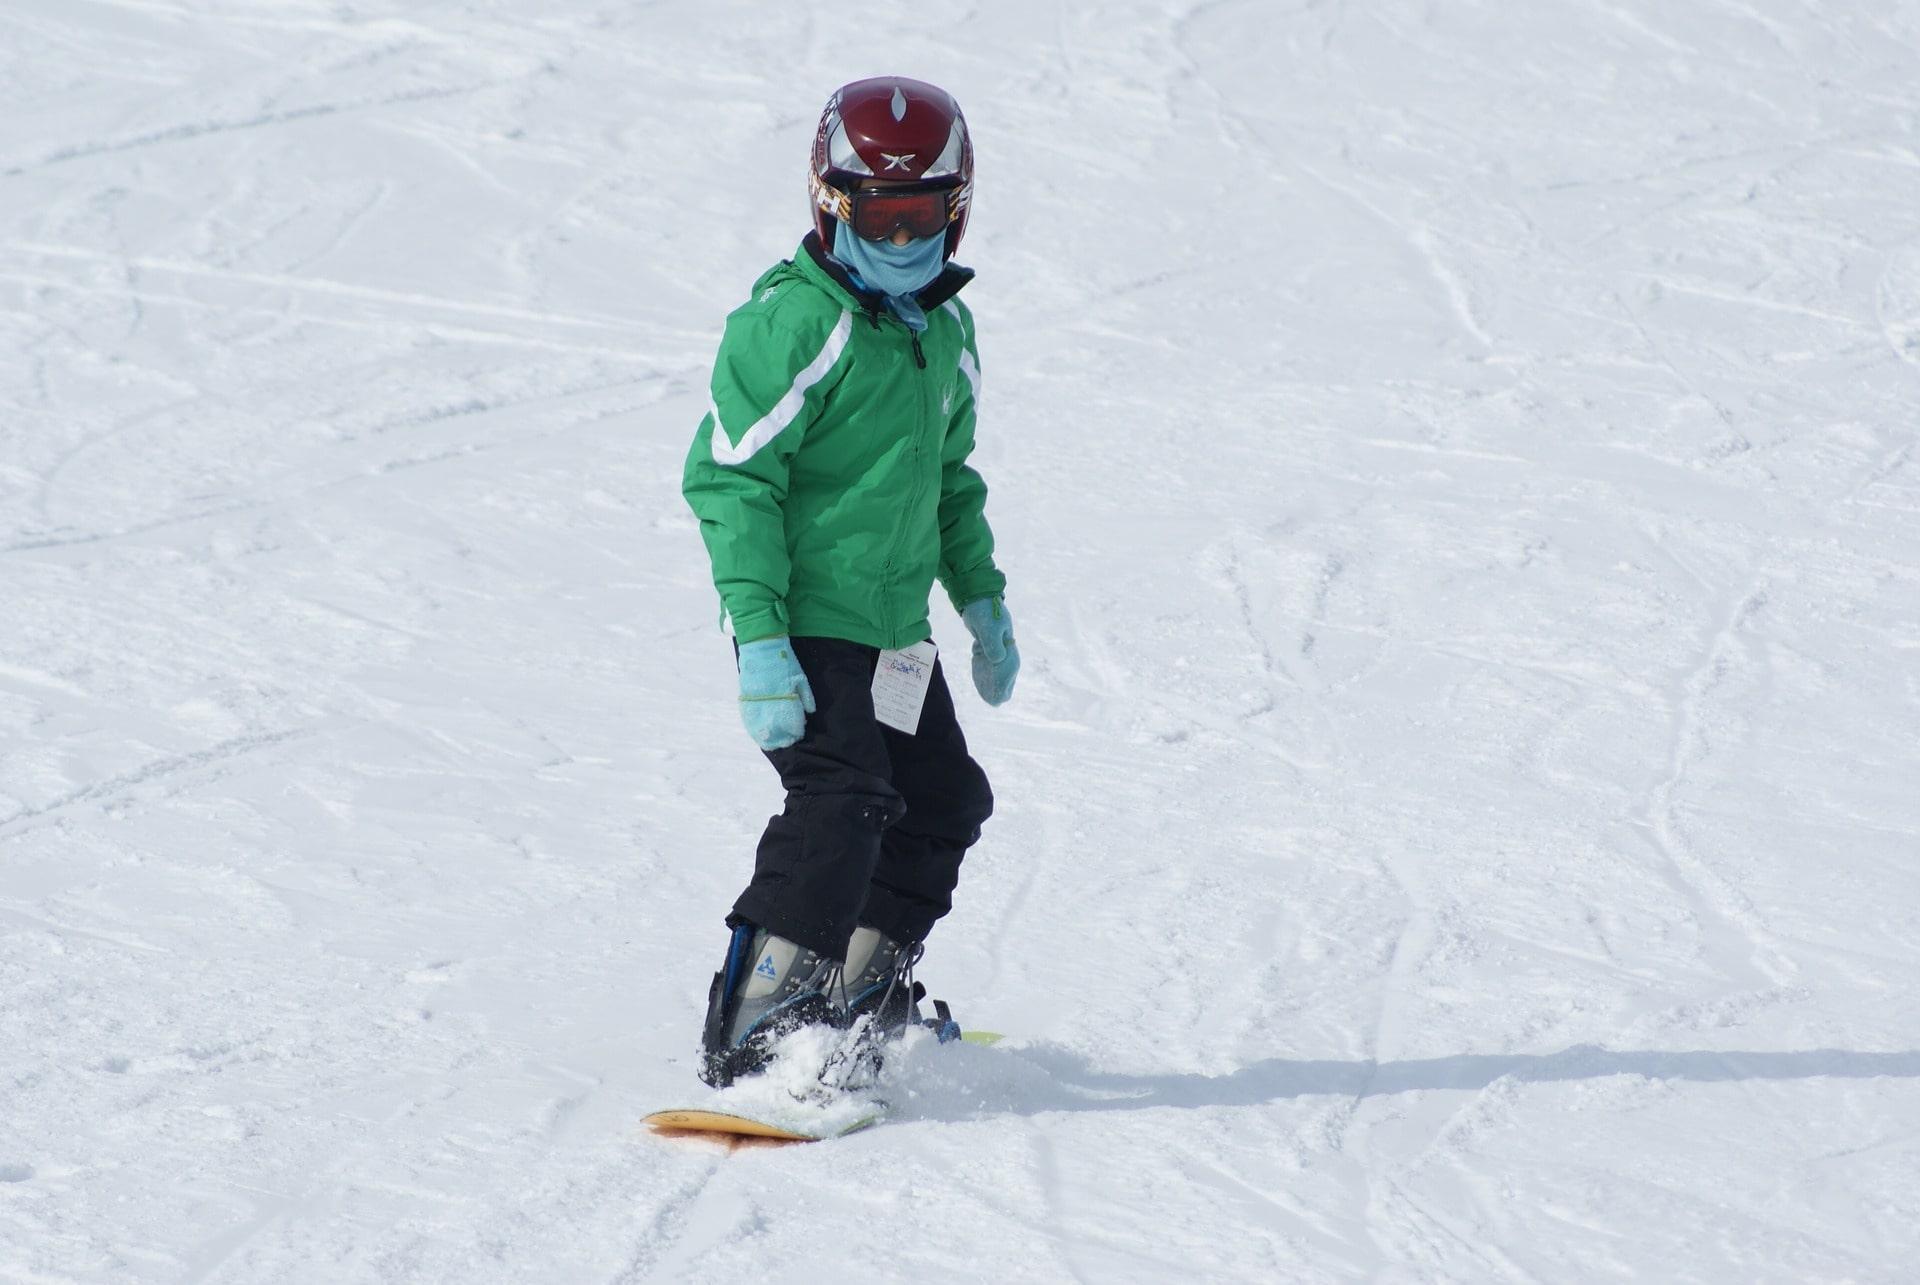 Snowboard Instructor Private - Beginner